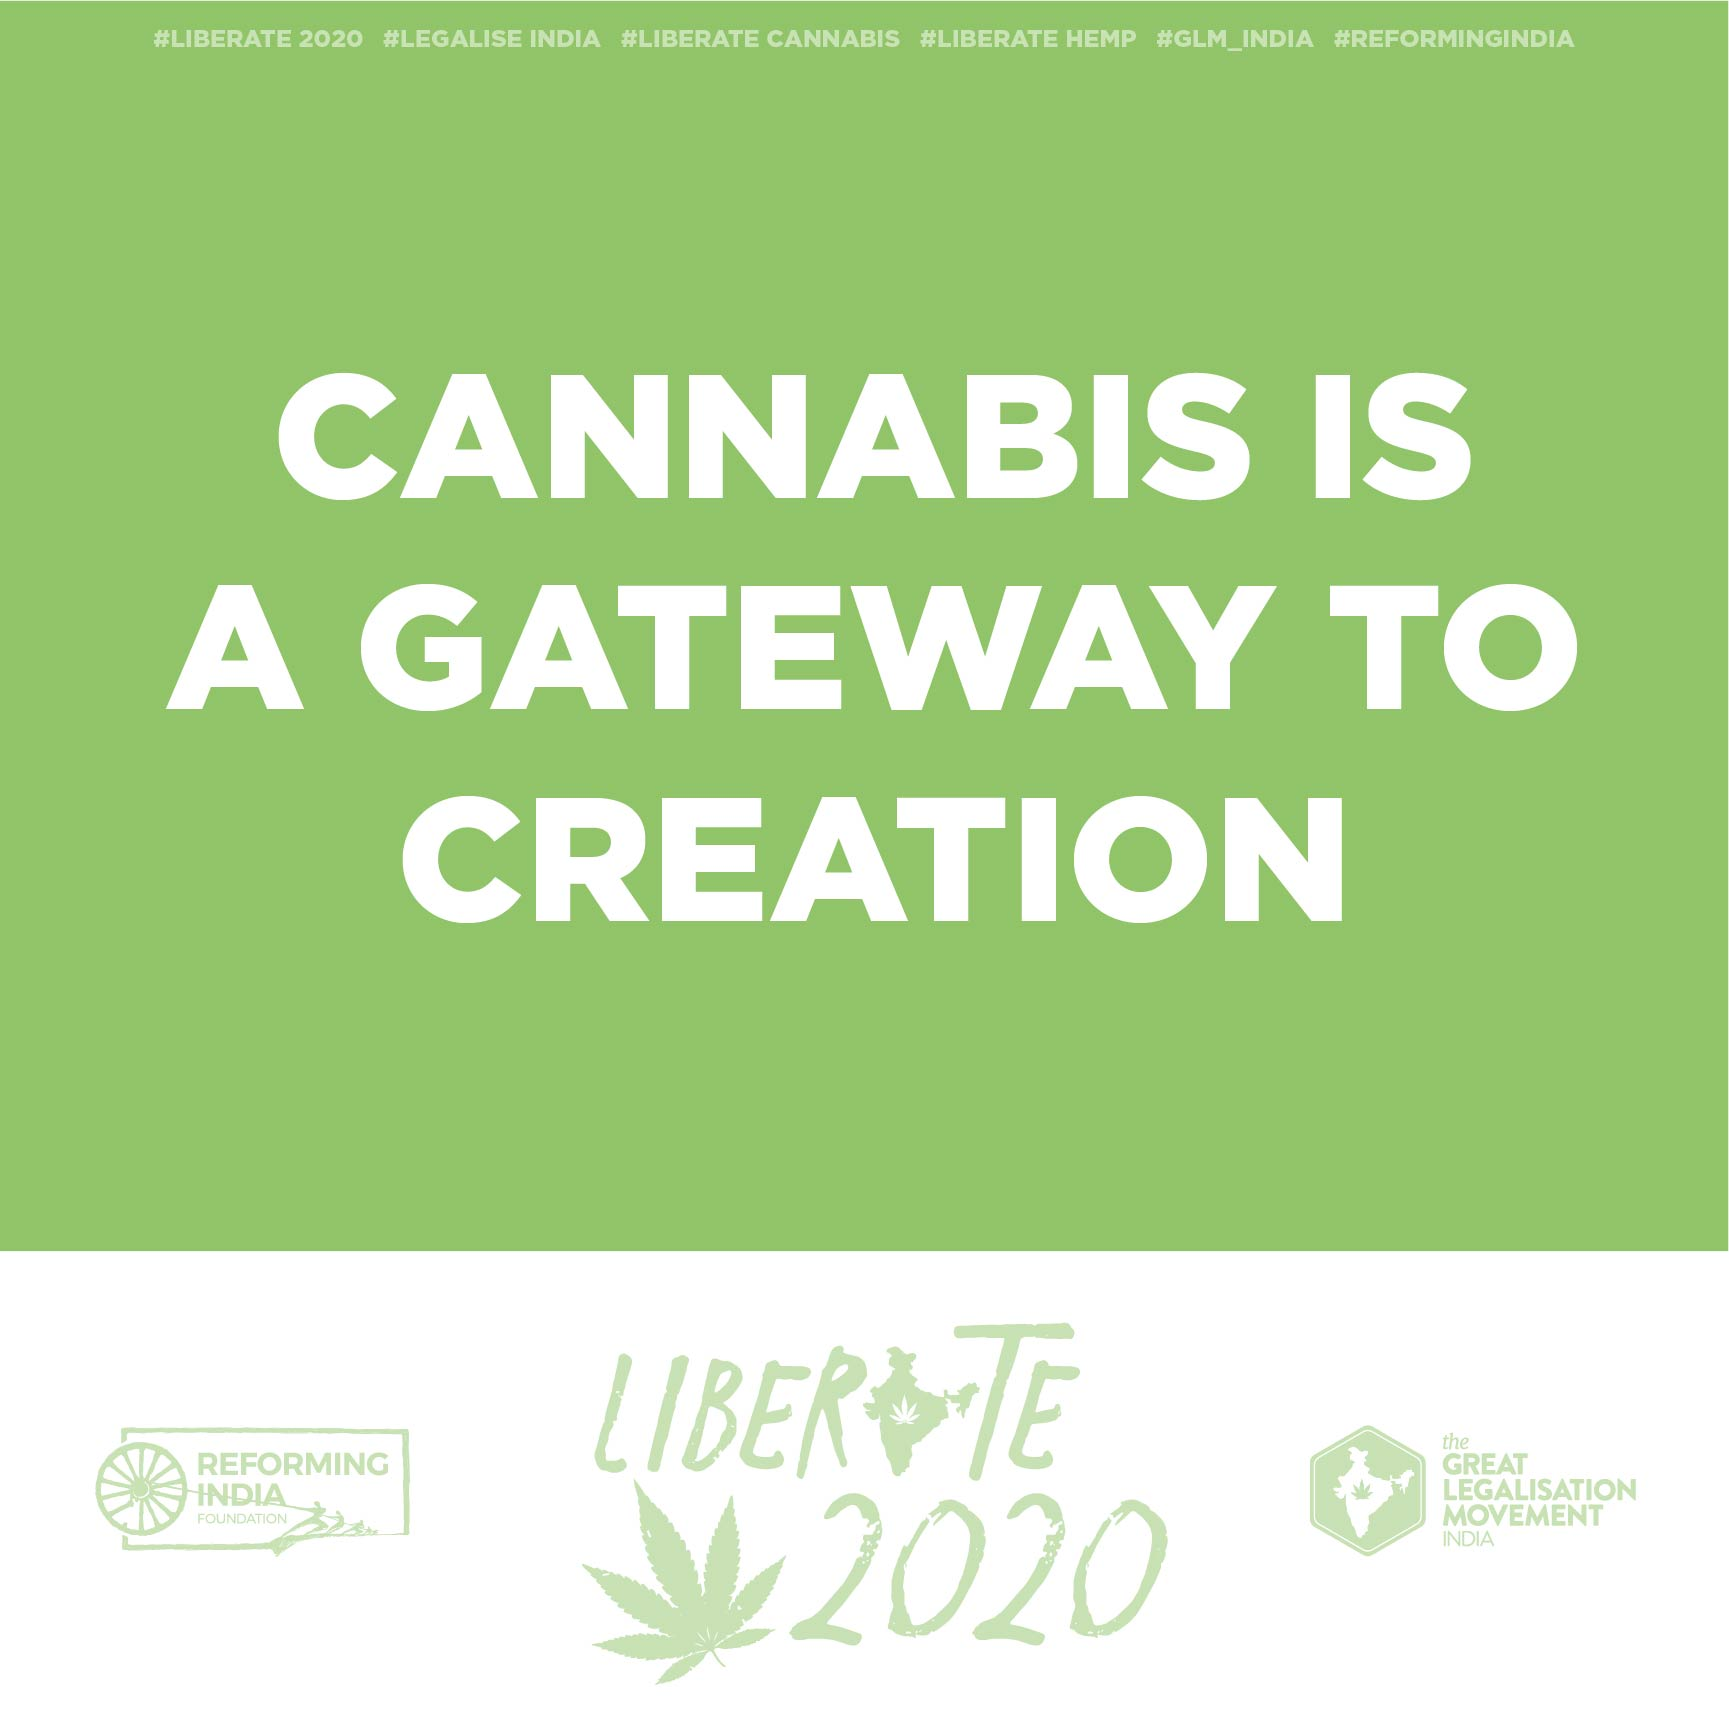 cannabisArtboard 1 copy 12-50.jpg